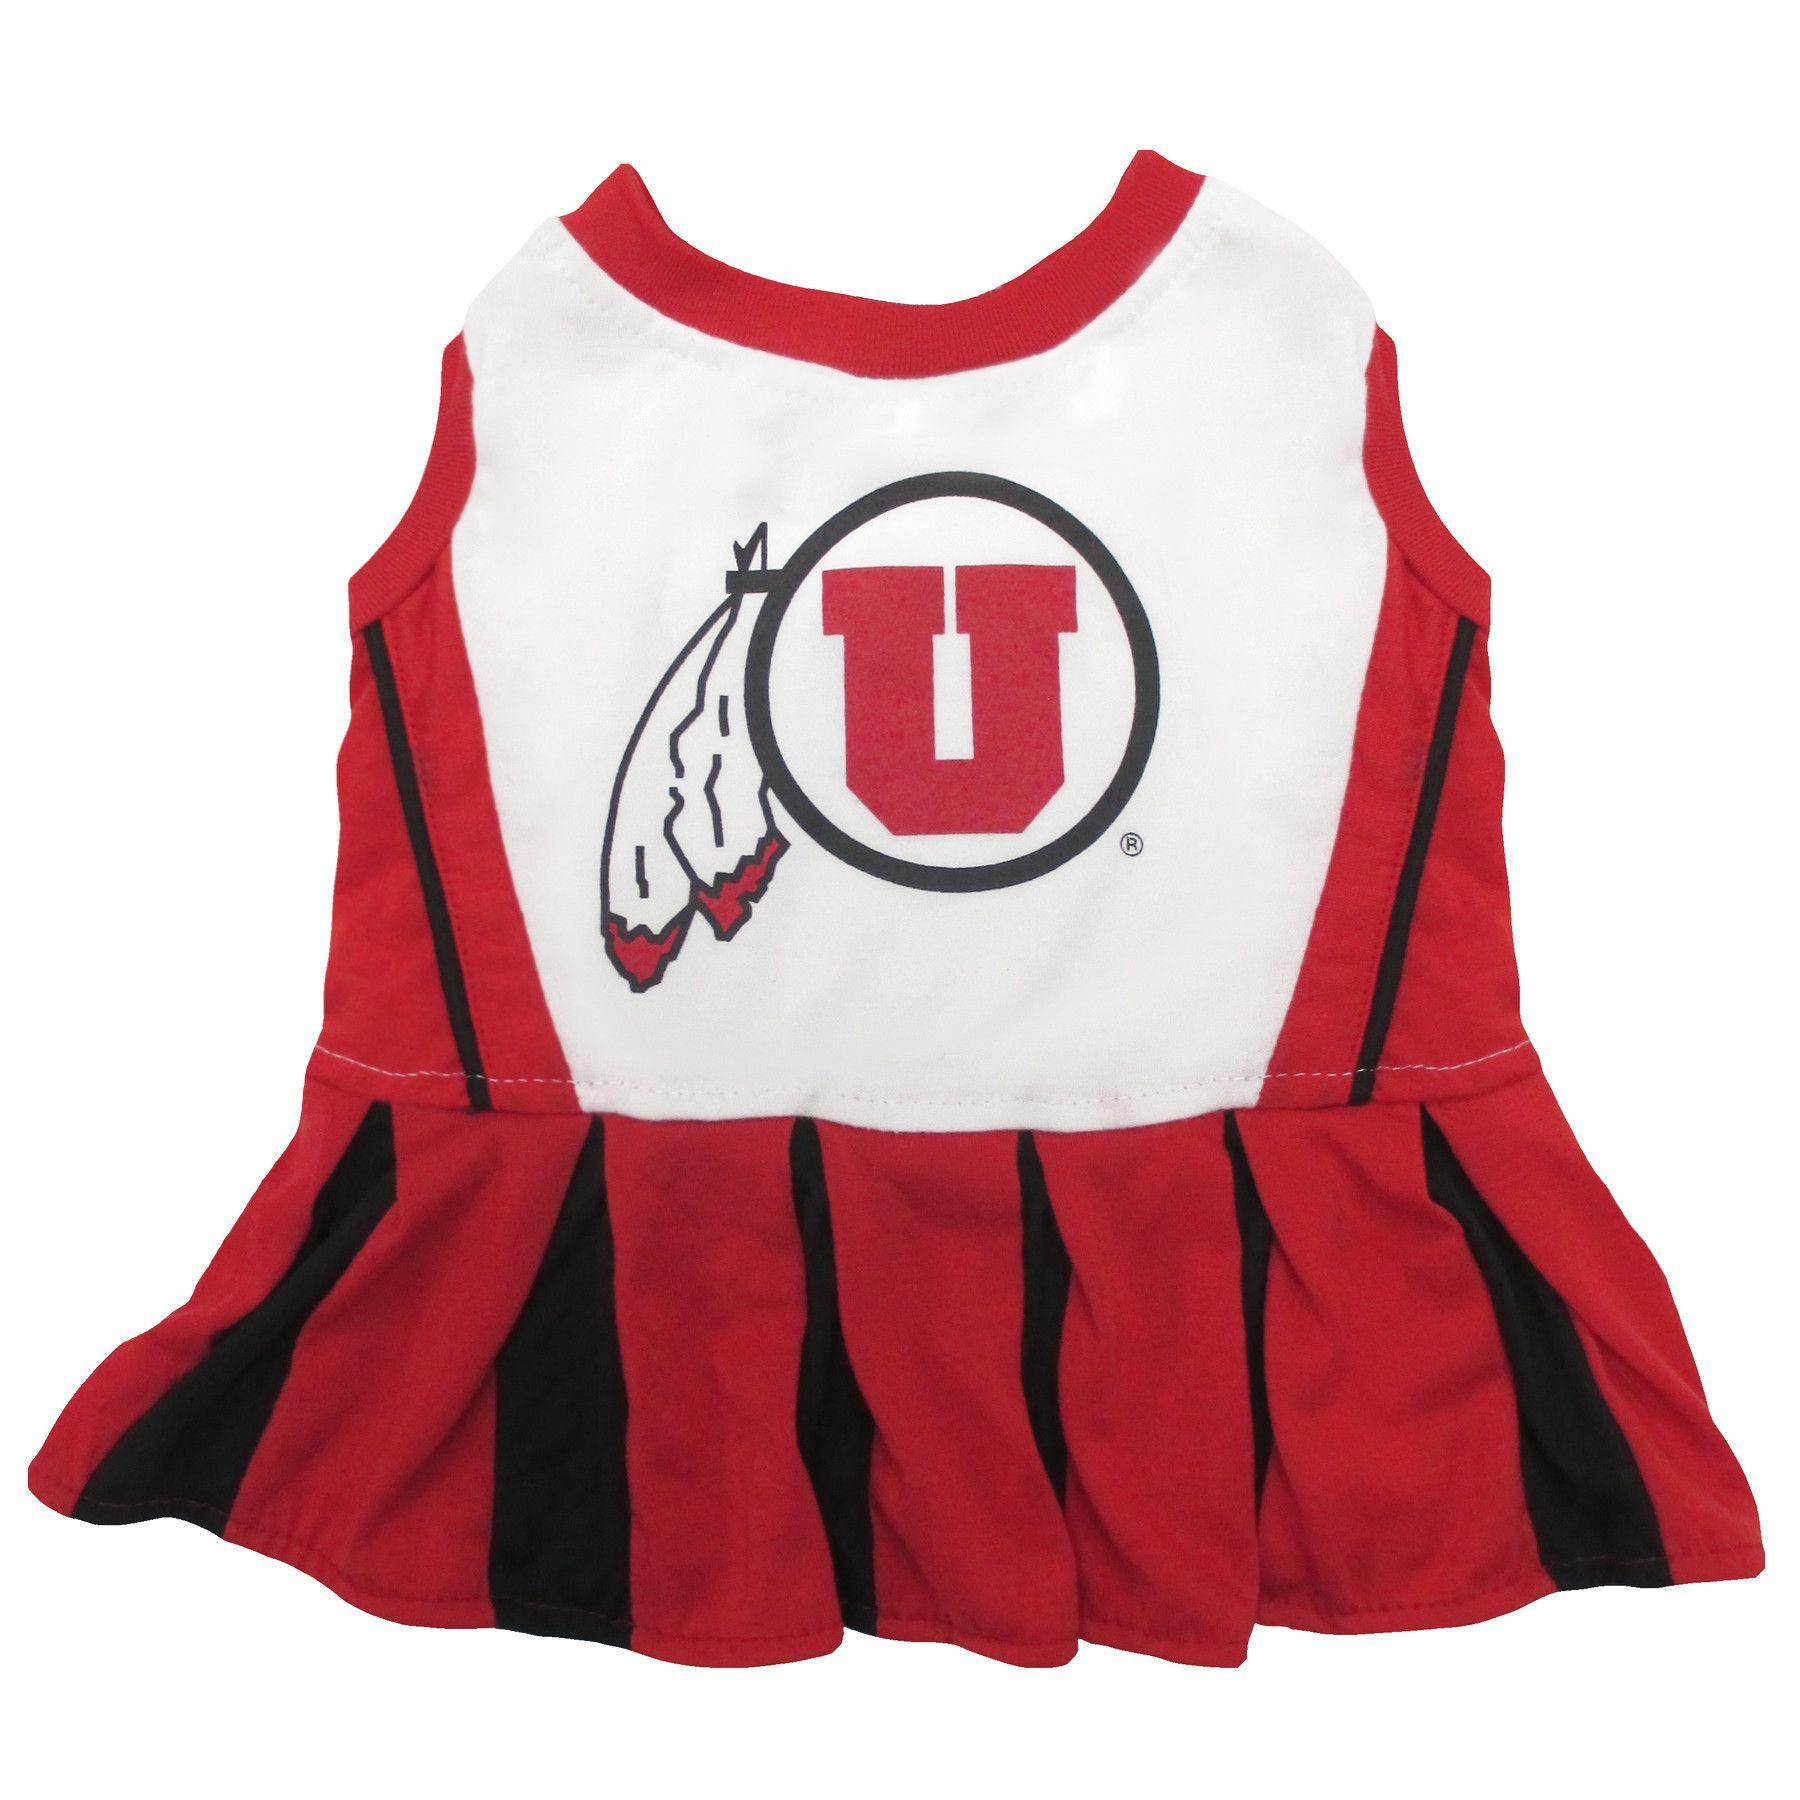 University of Utah Utes Cheerleader Pet Dress